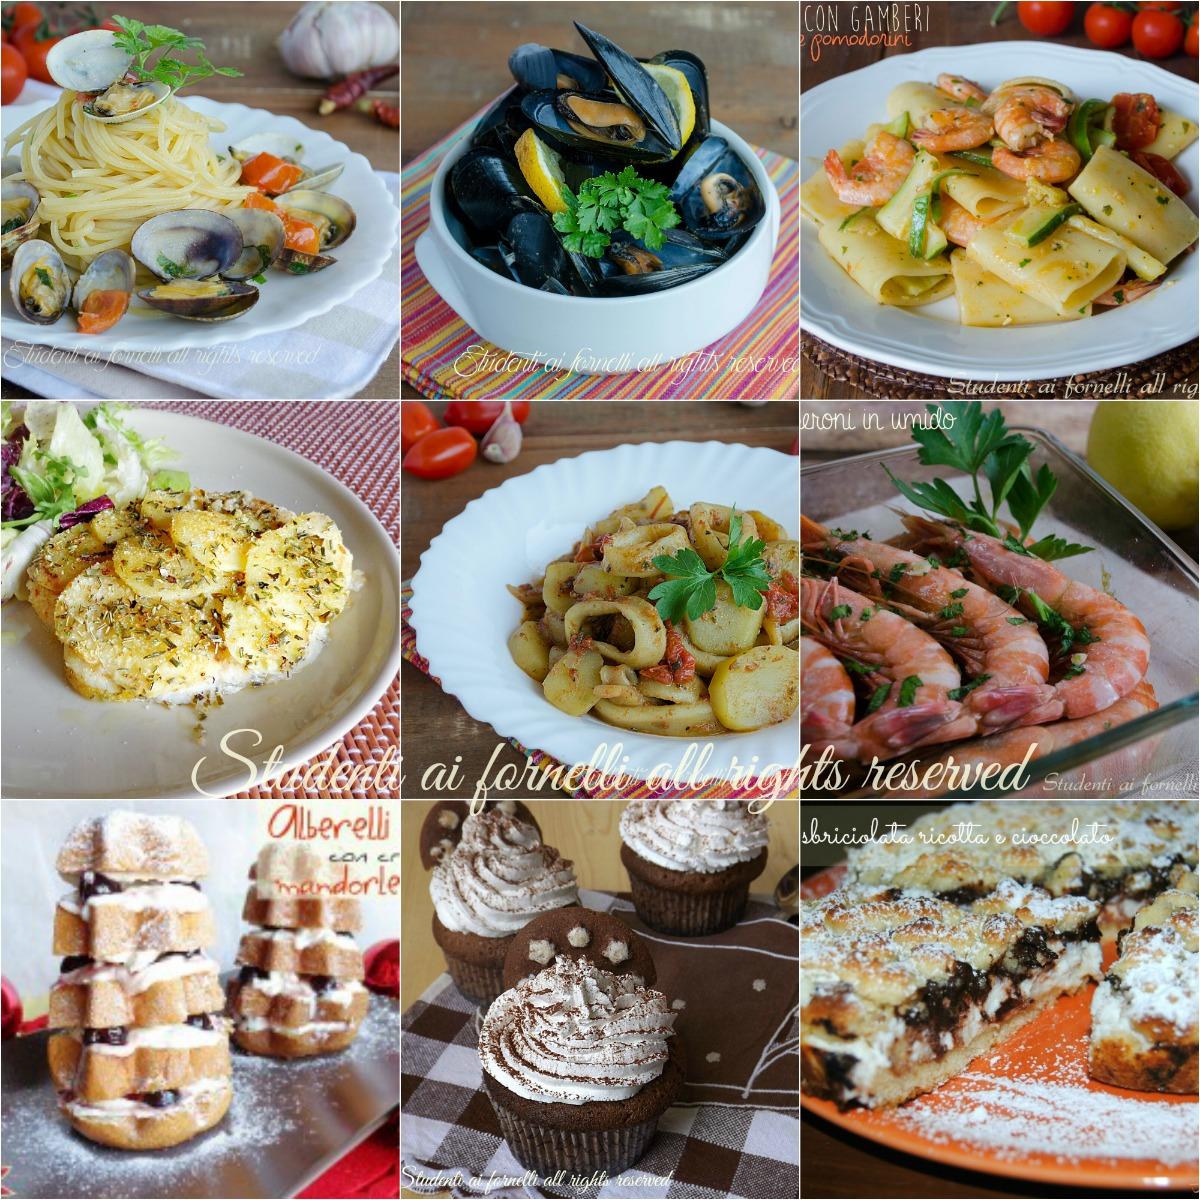 men vigilia di natale 2015 a base di pesce ricette